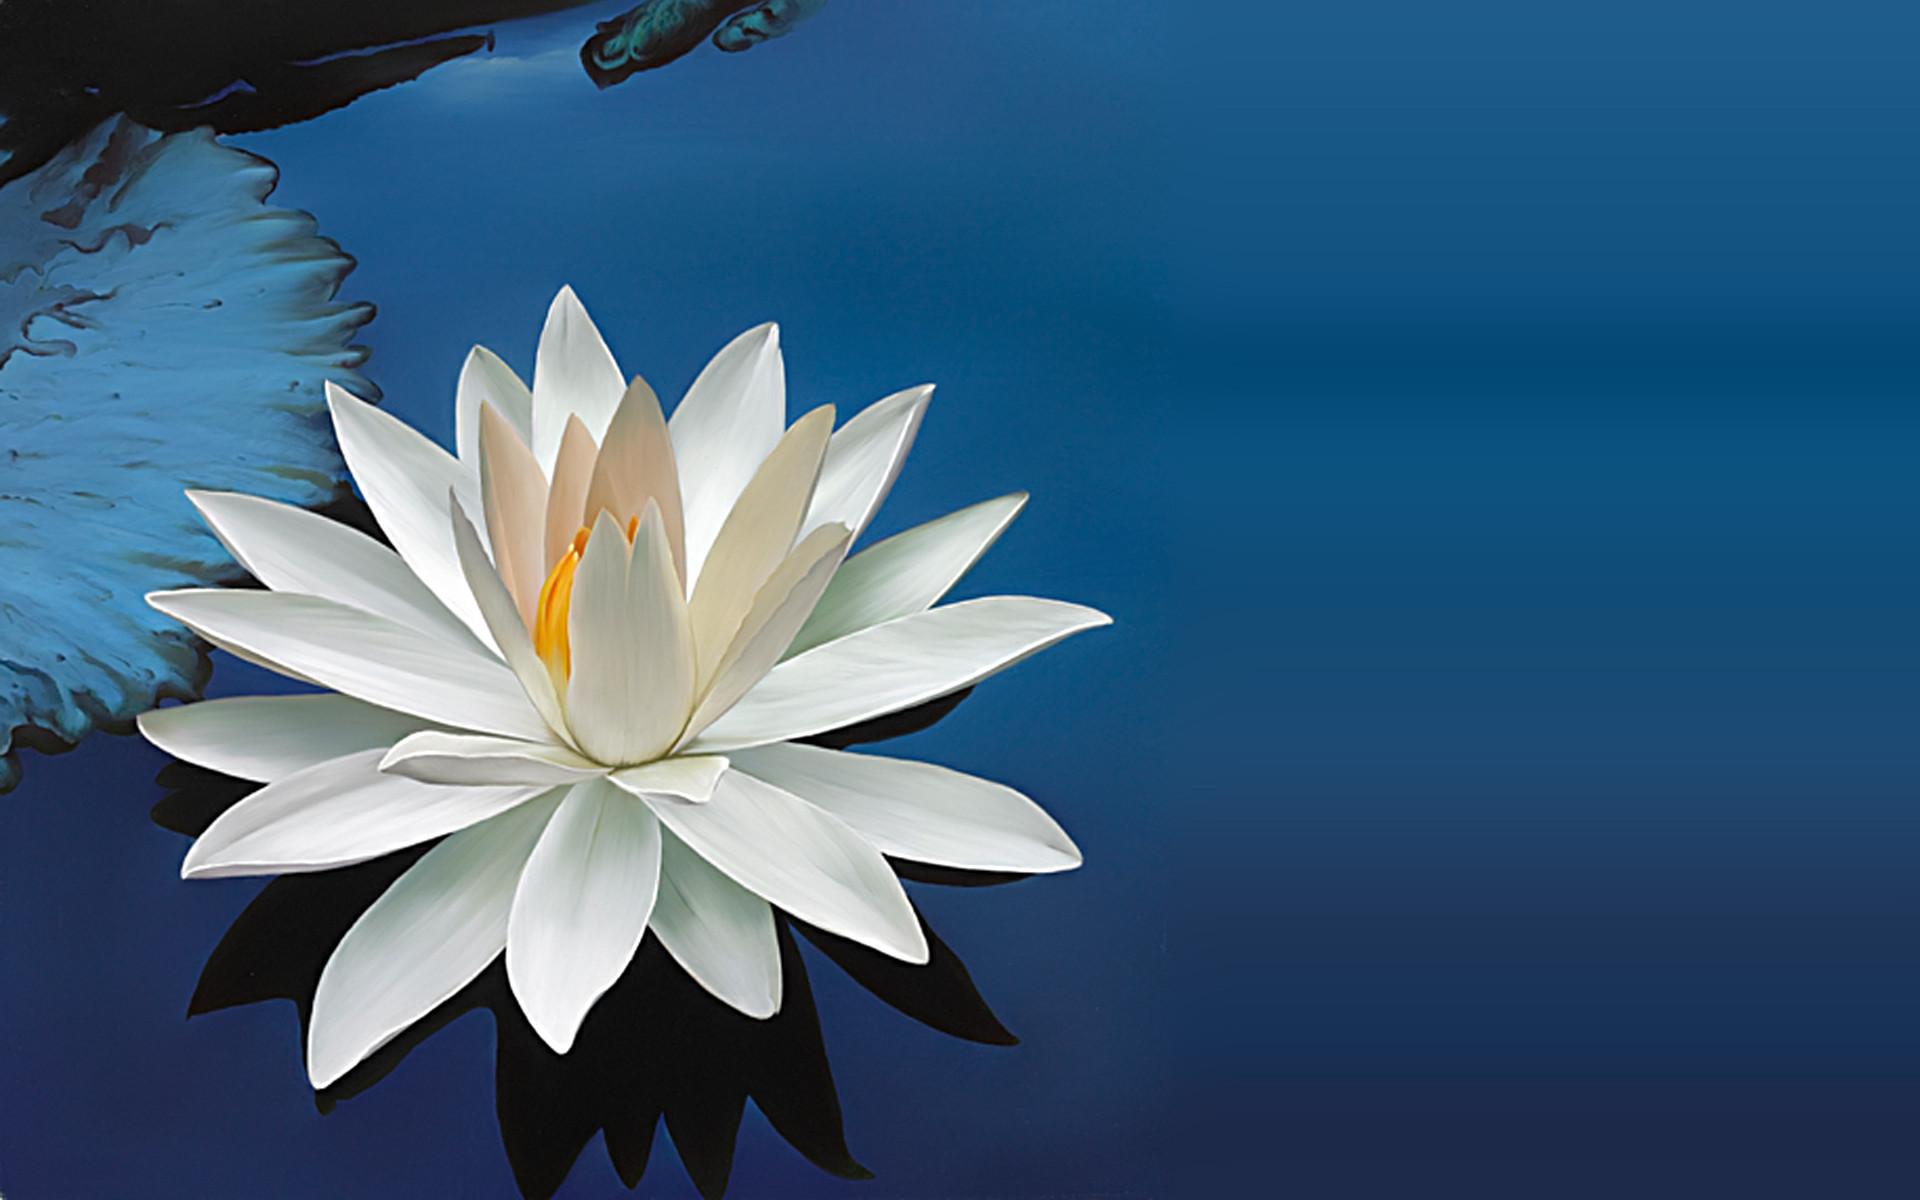 Lotus Flower Background 54 Images